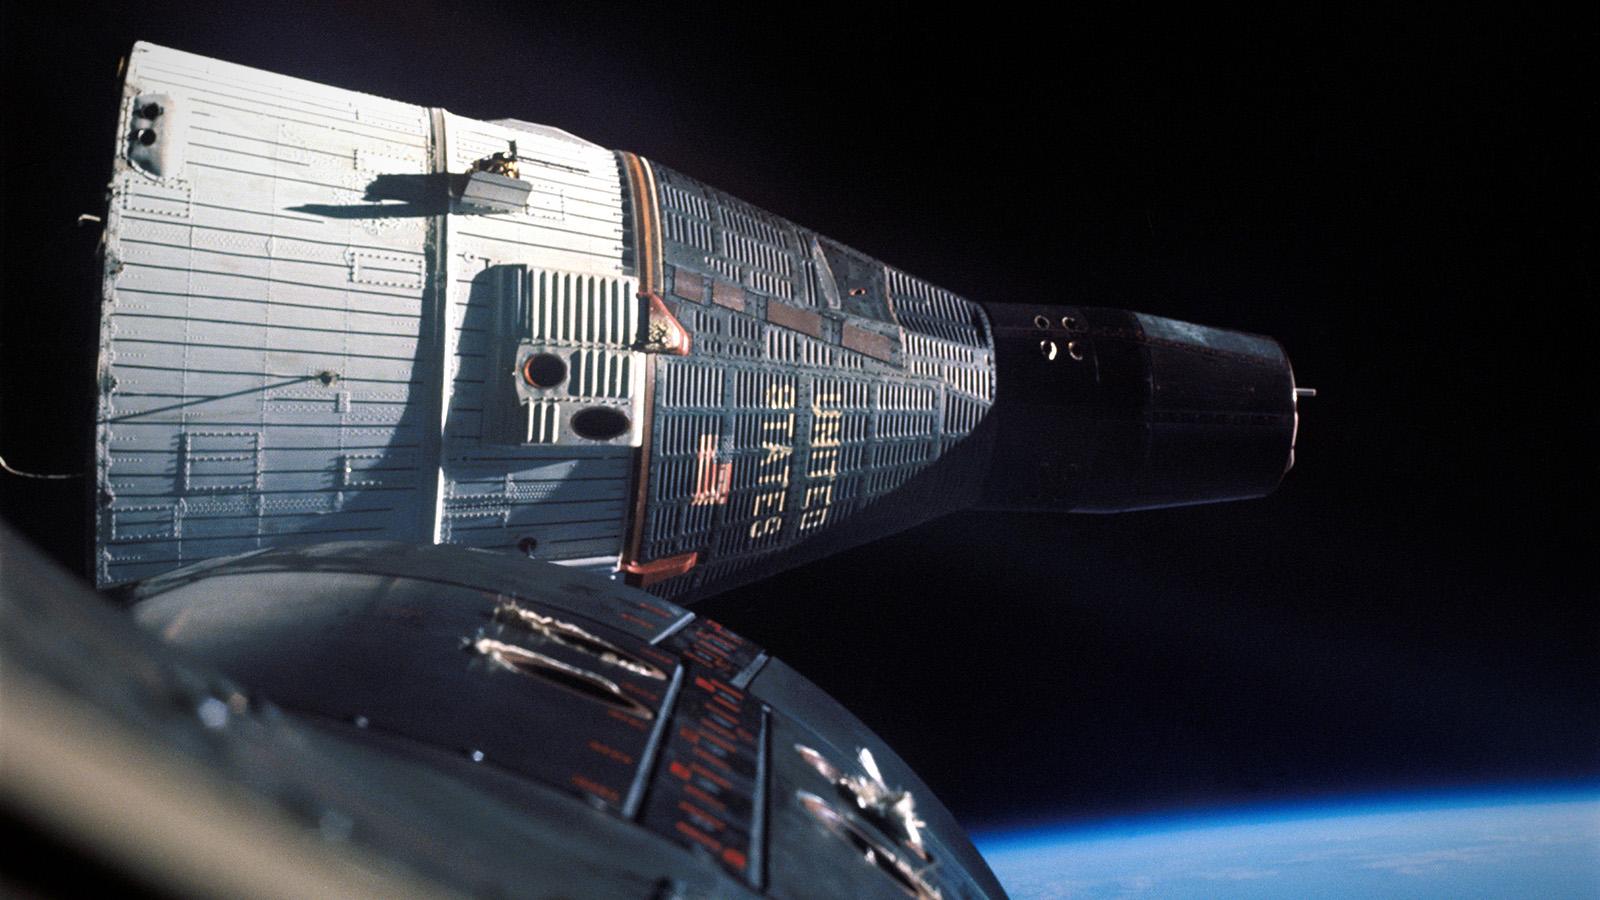 Gemini 7 as seen from Gemini 6, image courtesy NASA